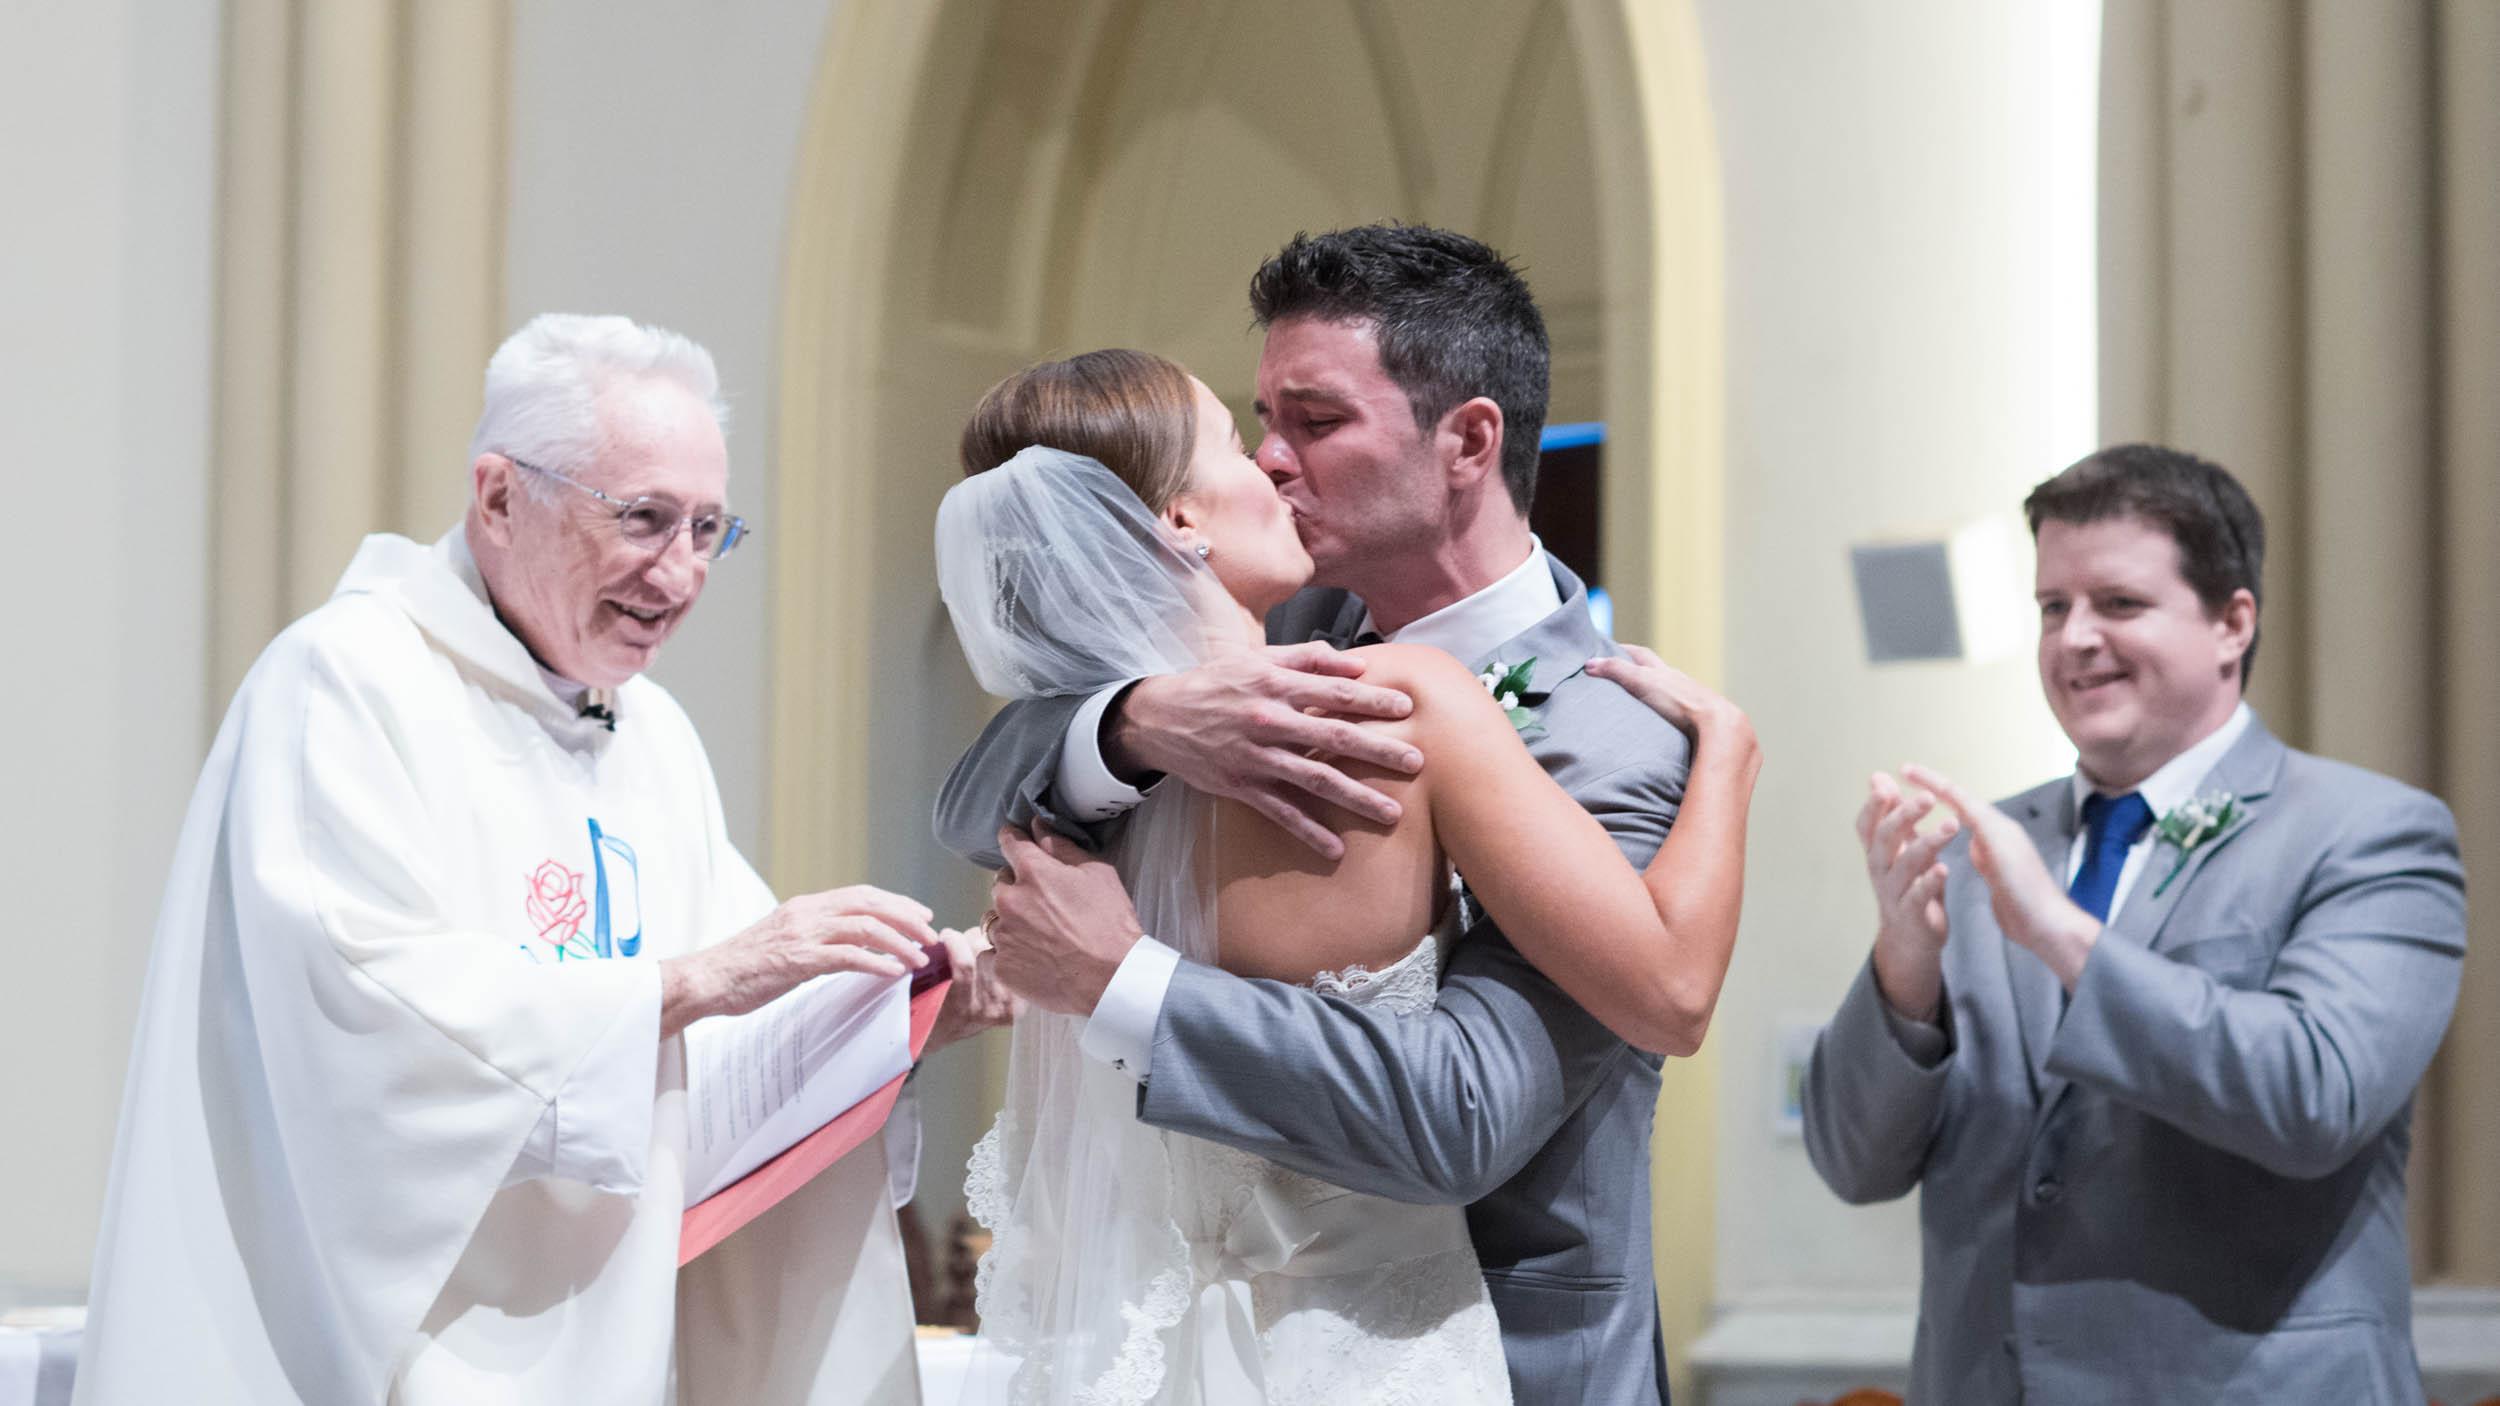 dc+metro+wedding+photographer+vadym+guliuk+photography+wedding+first+kiss-2021.jpg